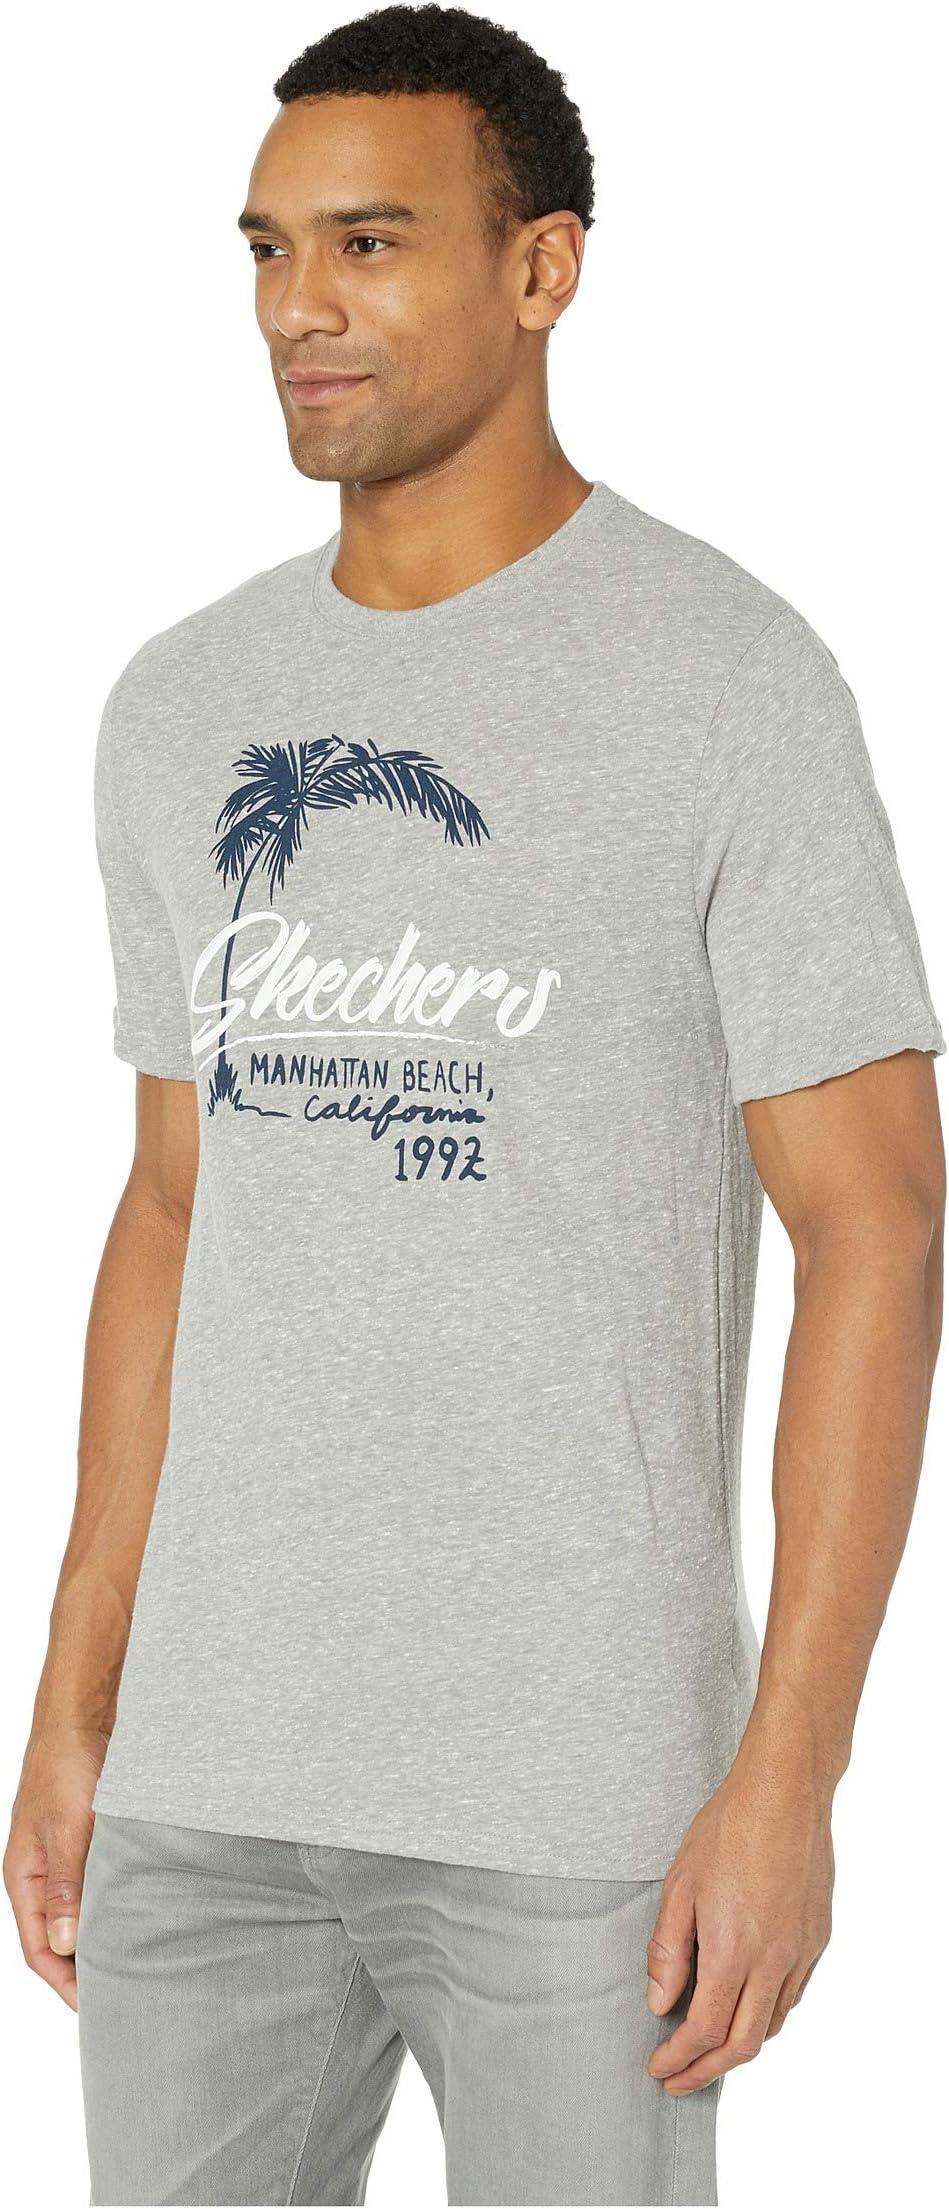 SKECHERS Performance Blissful Graphic Tee Manhattan Beach H25W2